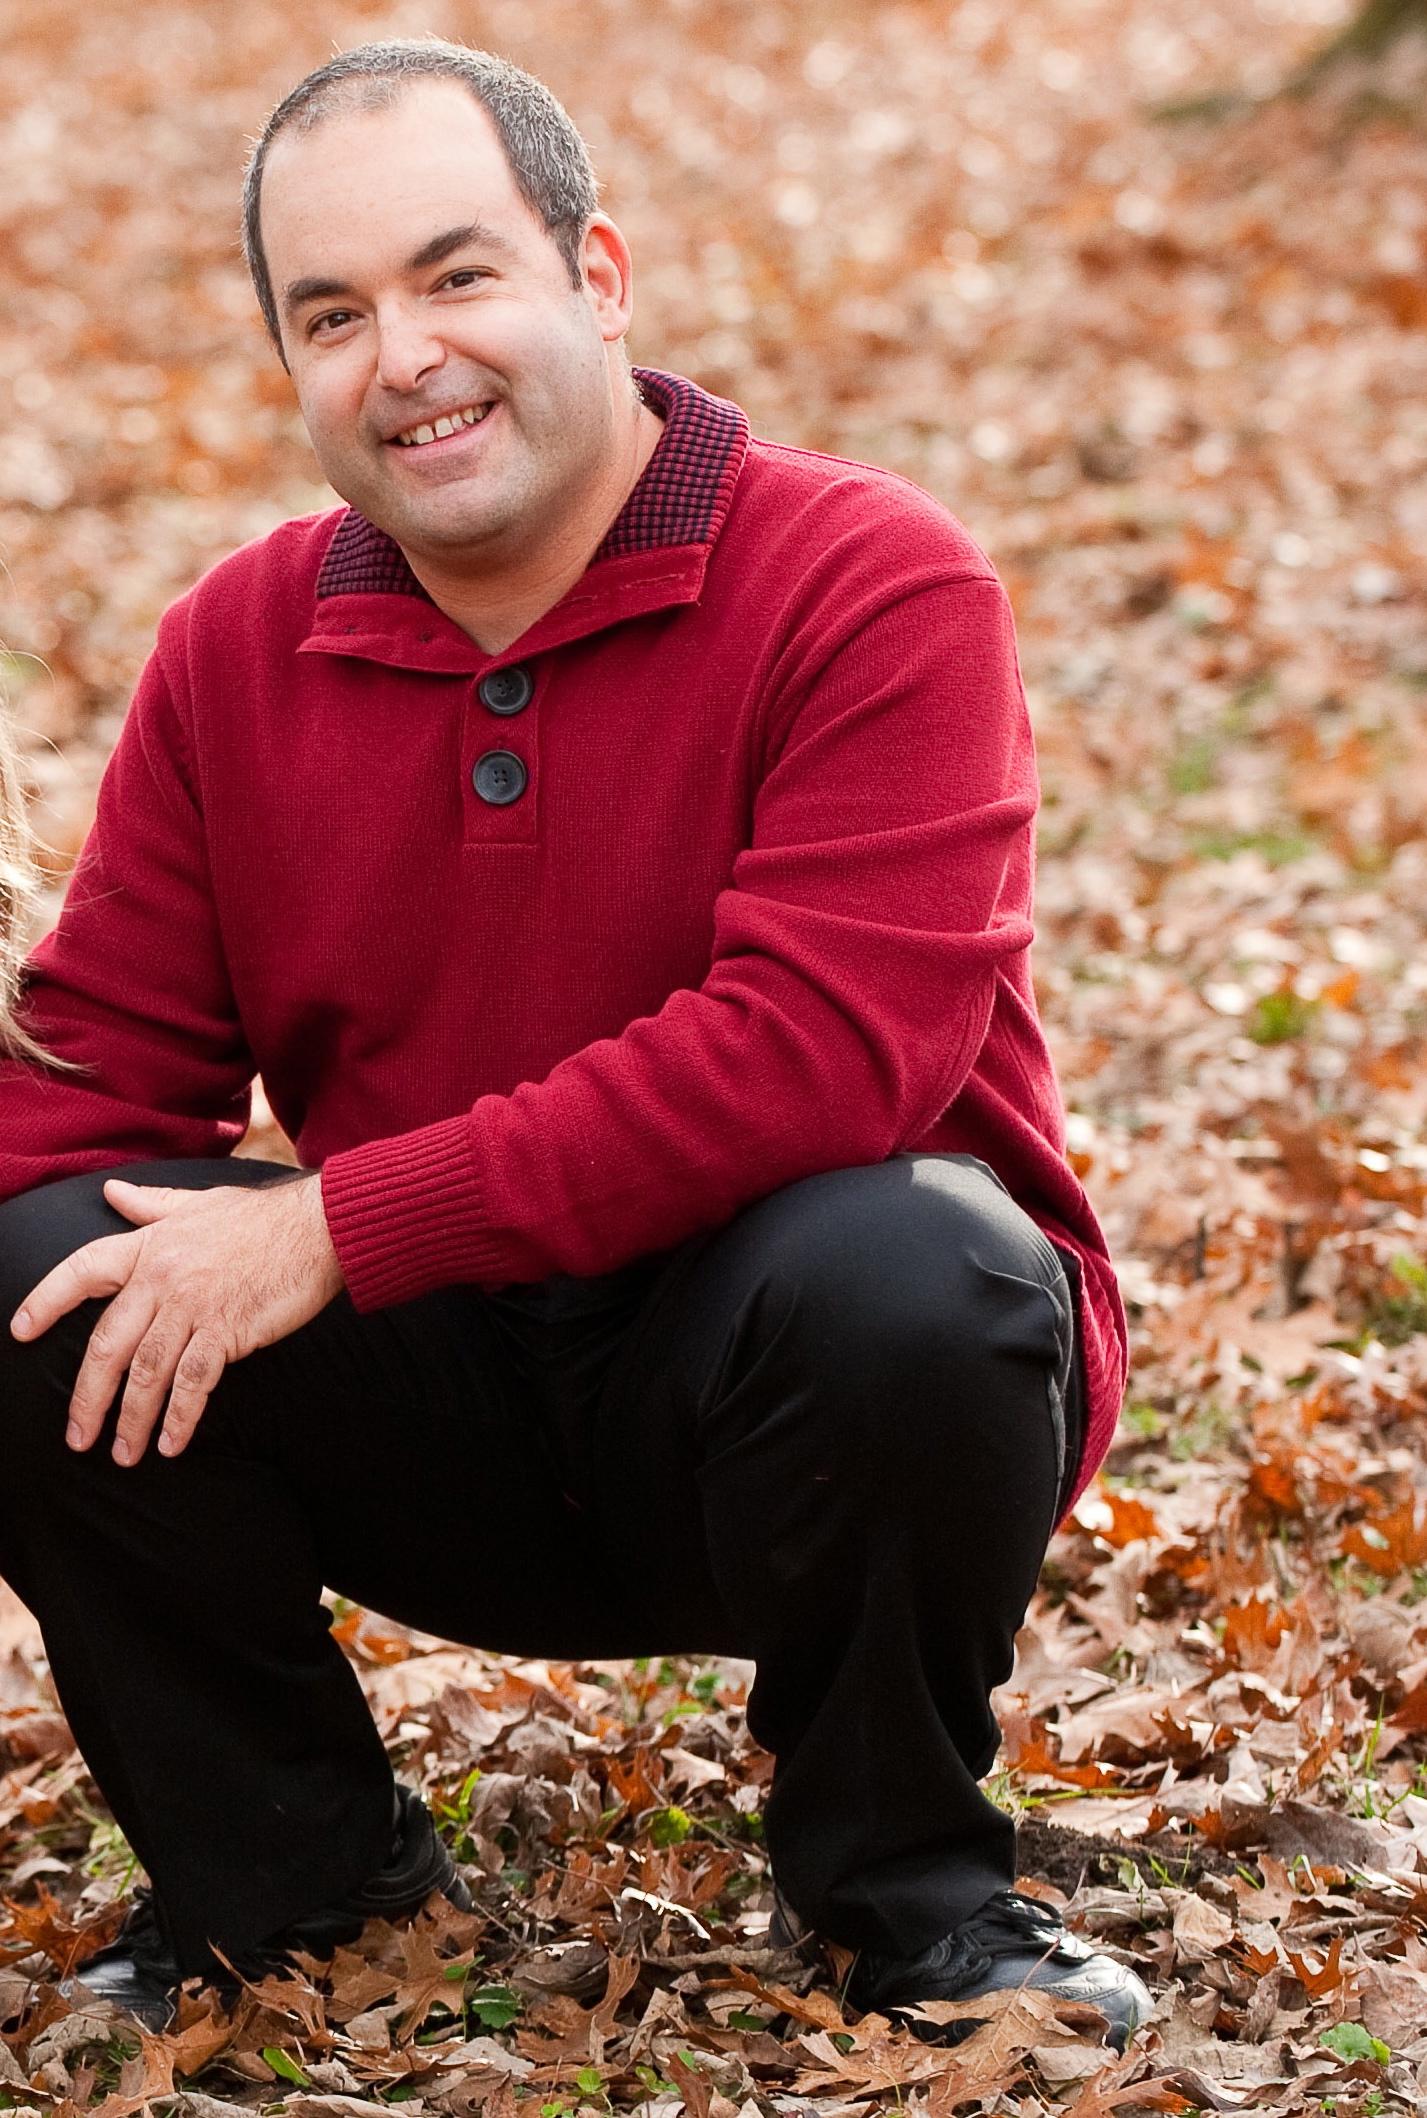 Meet the Trainer: Timothy Warner